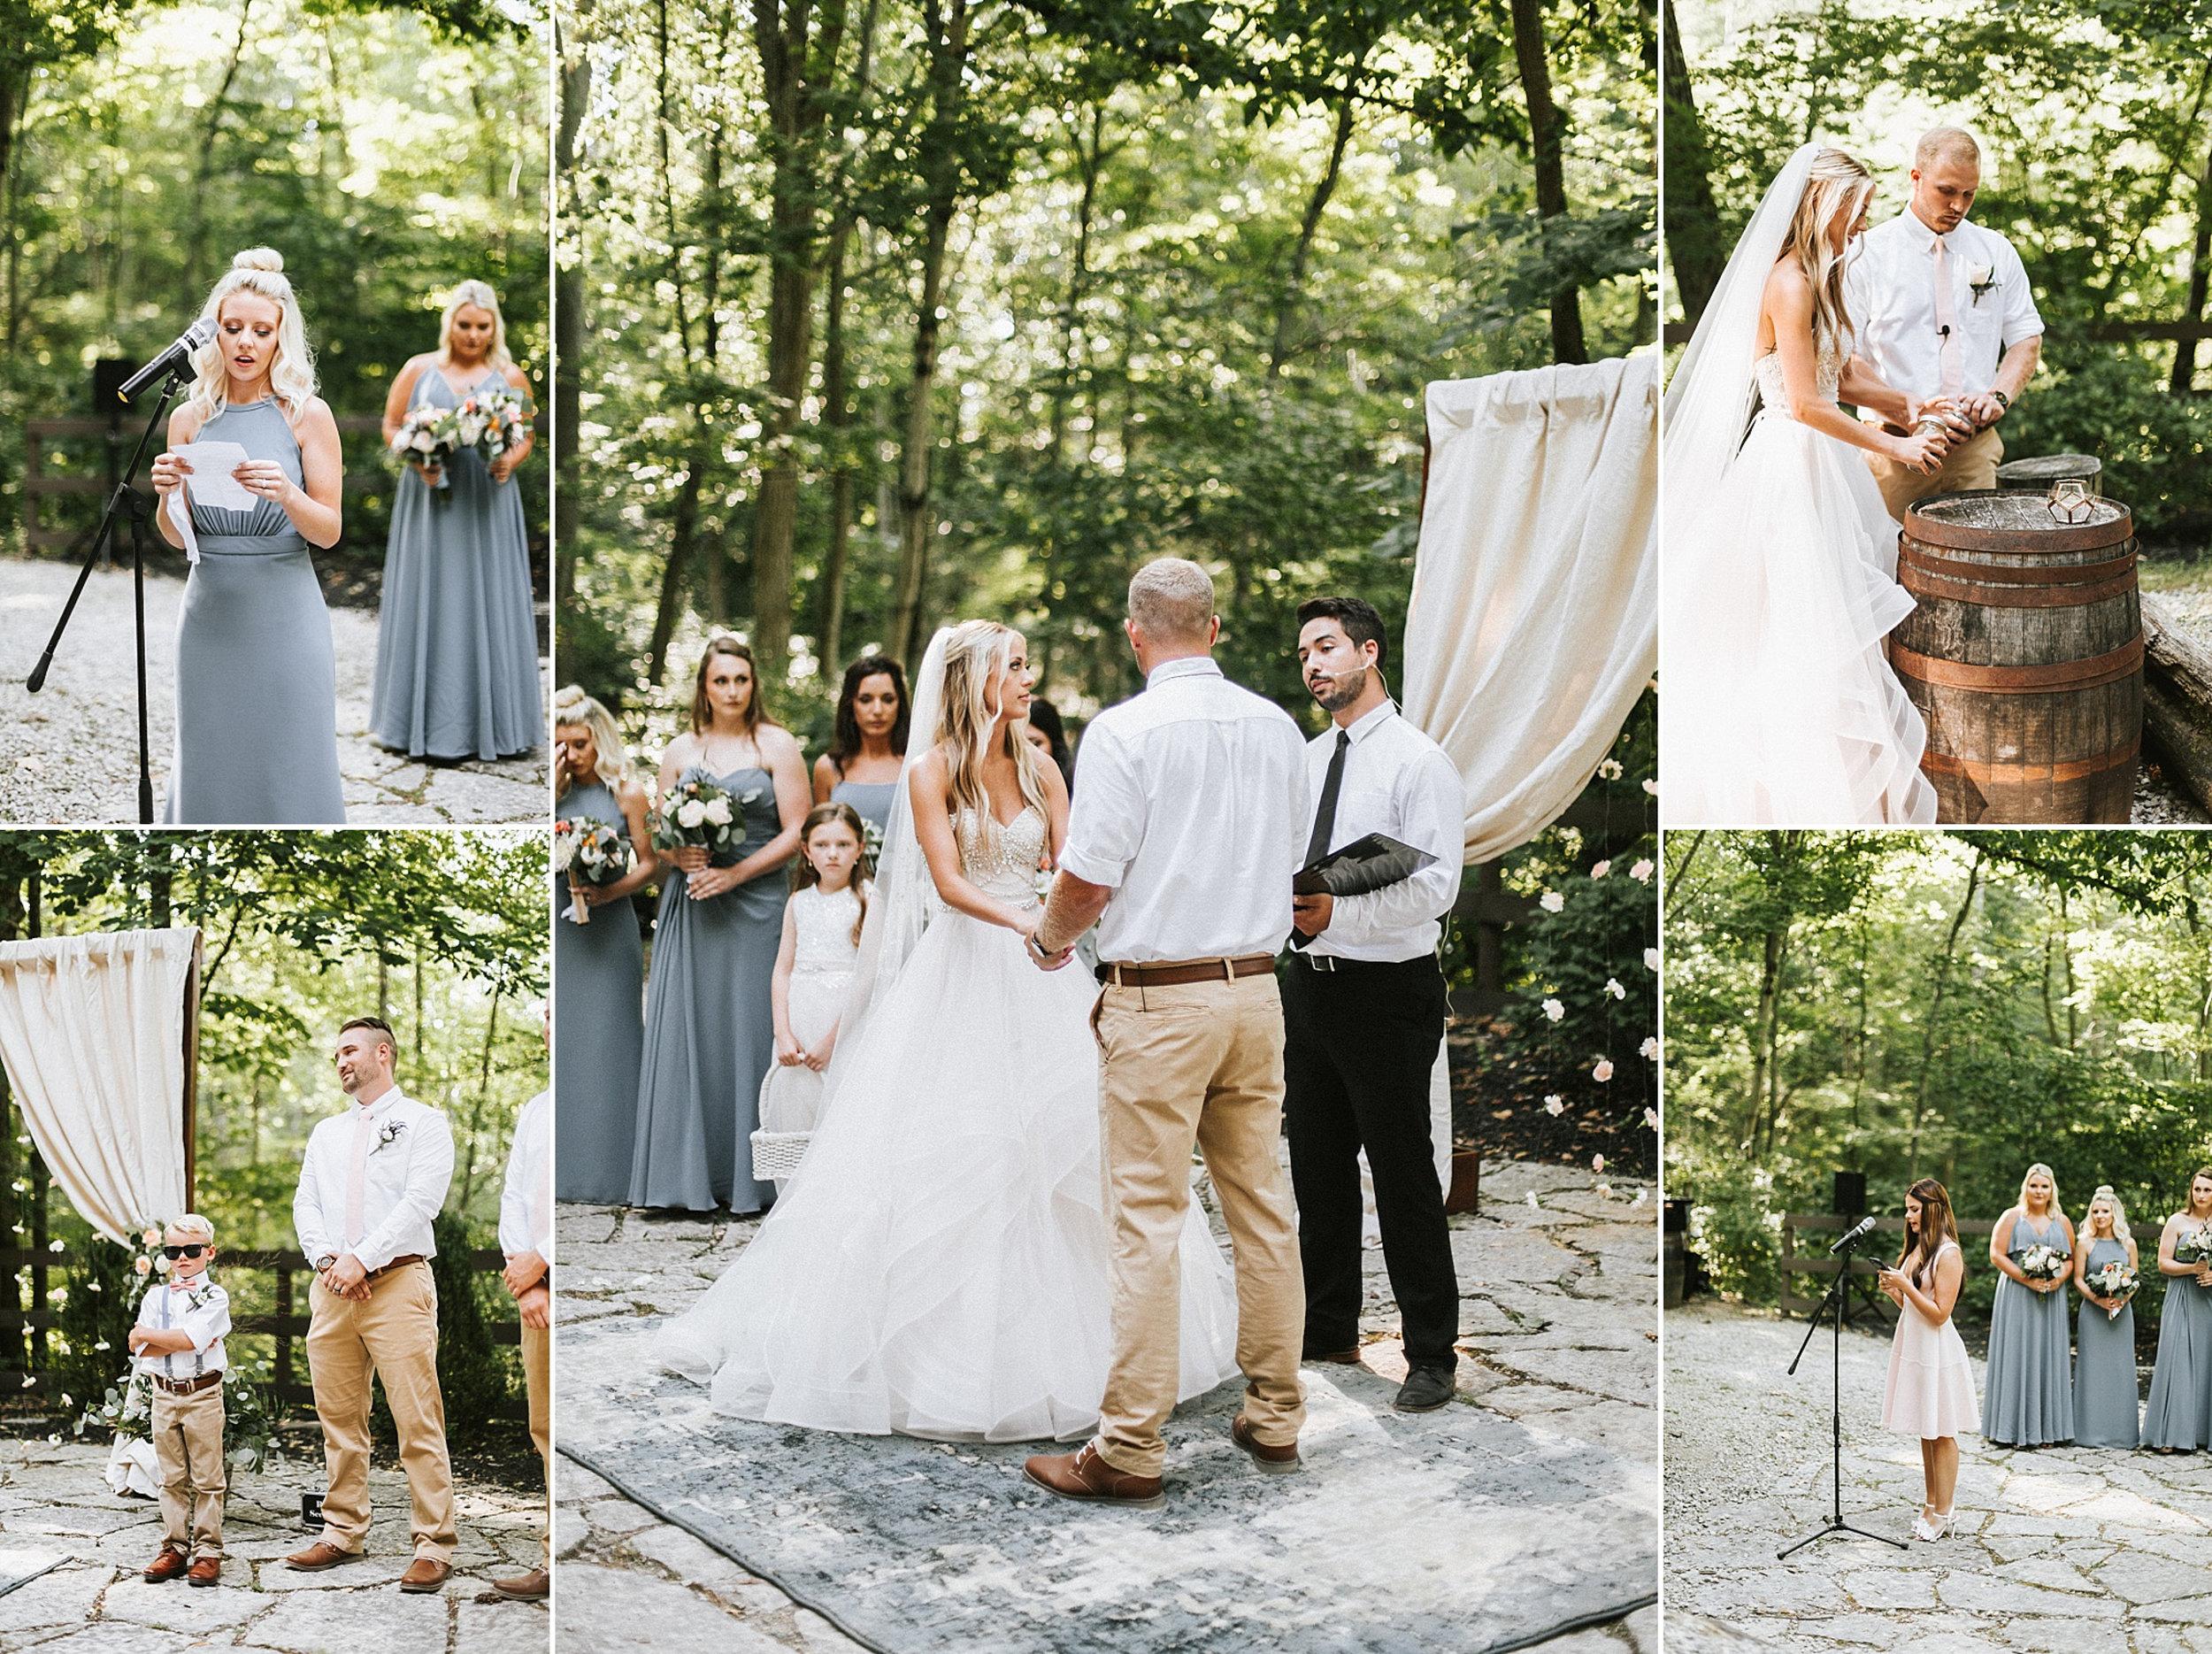 Brooke Townsend Photography - Cincinnati Wedding Photographer (72 of 153).jpg